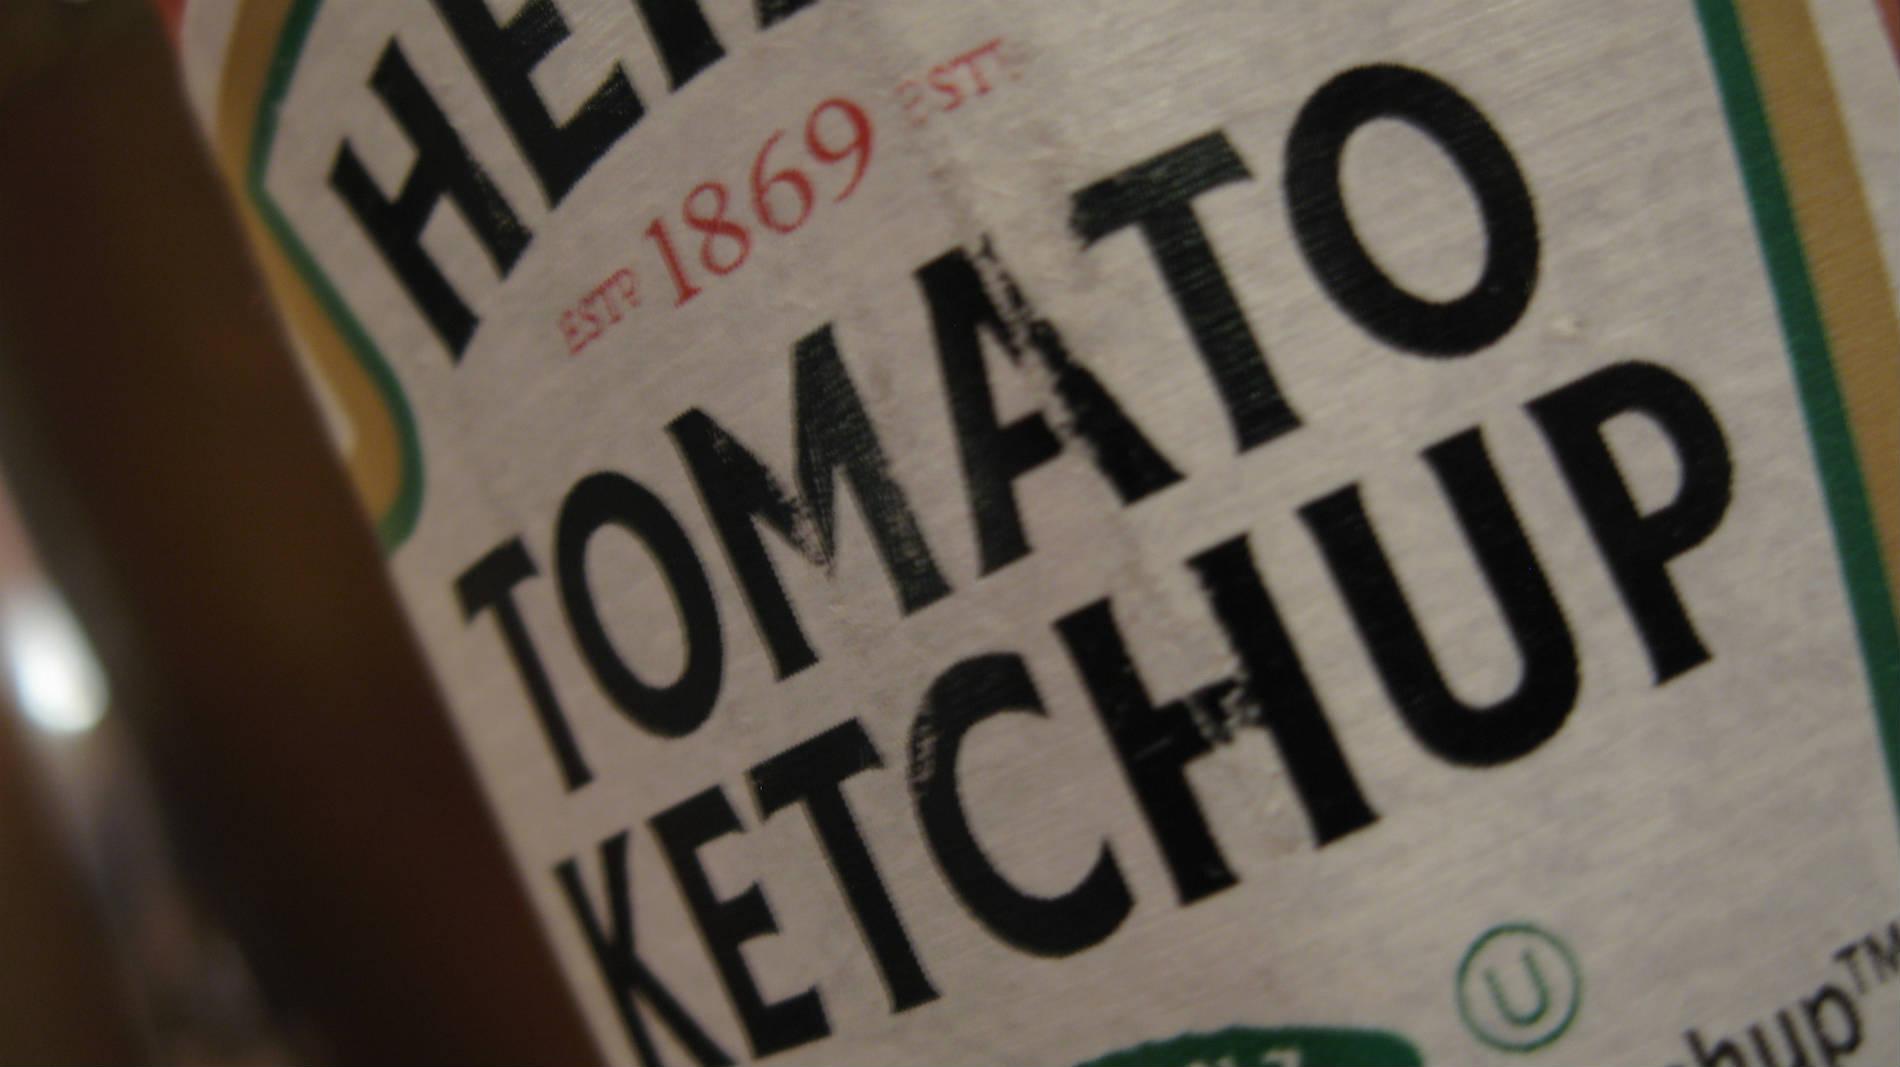 Condiment-conundrum-ketchup